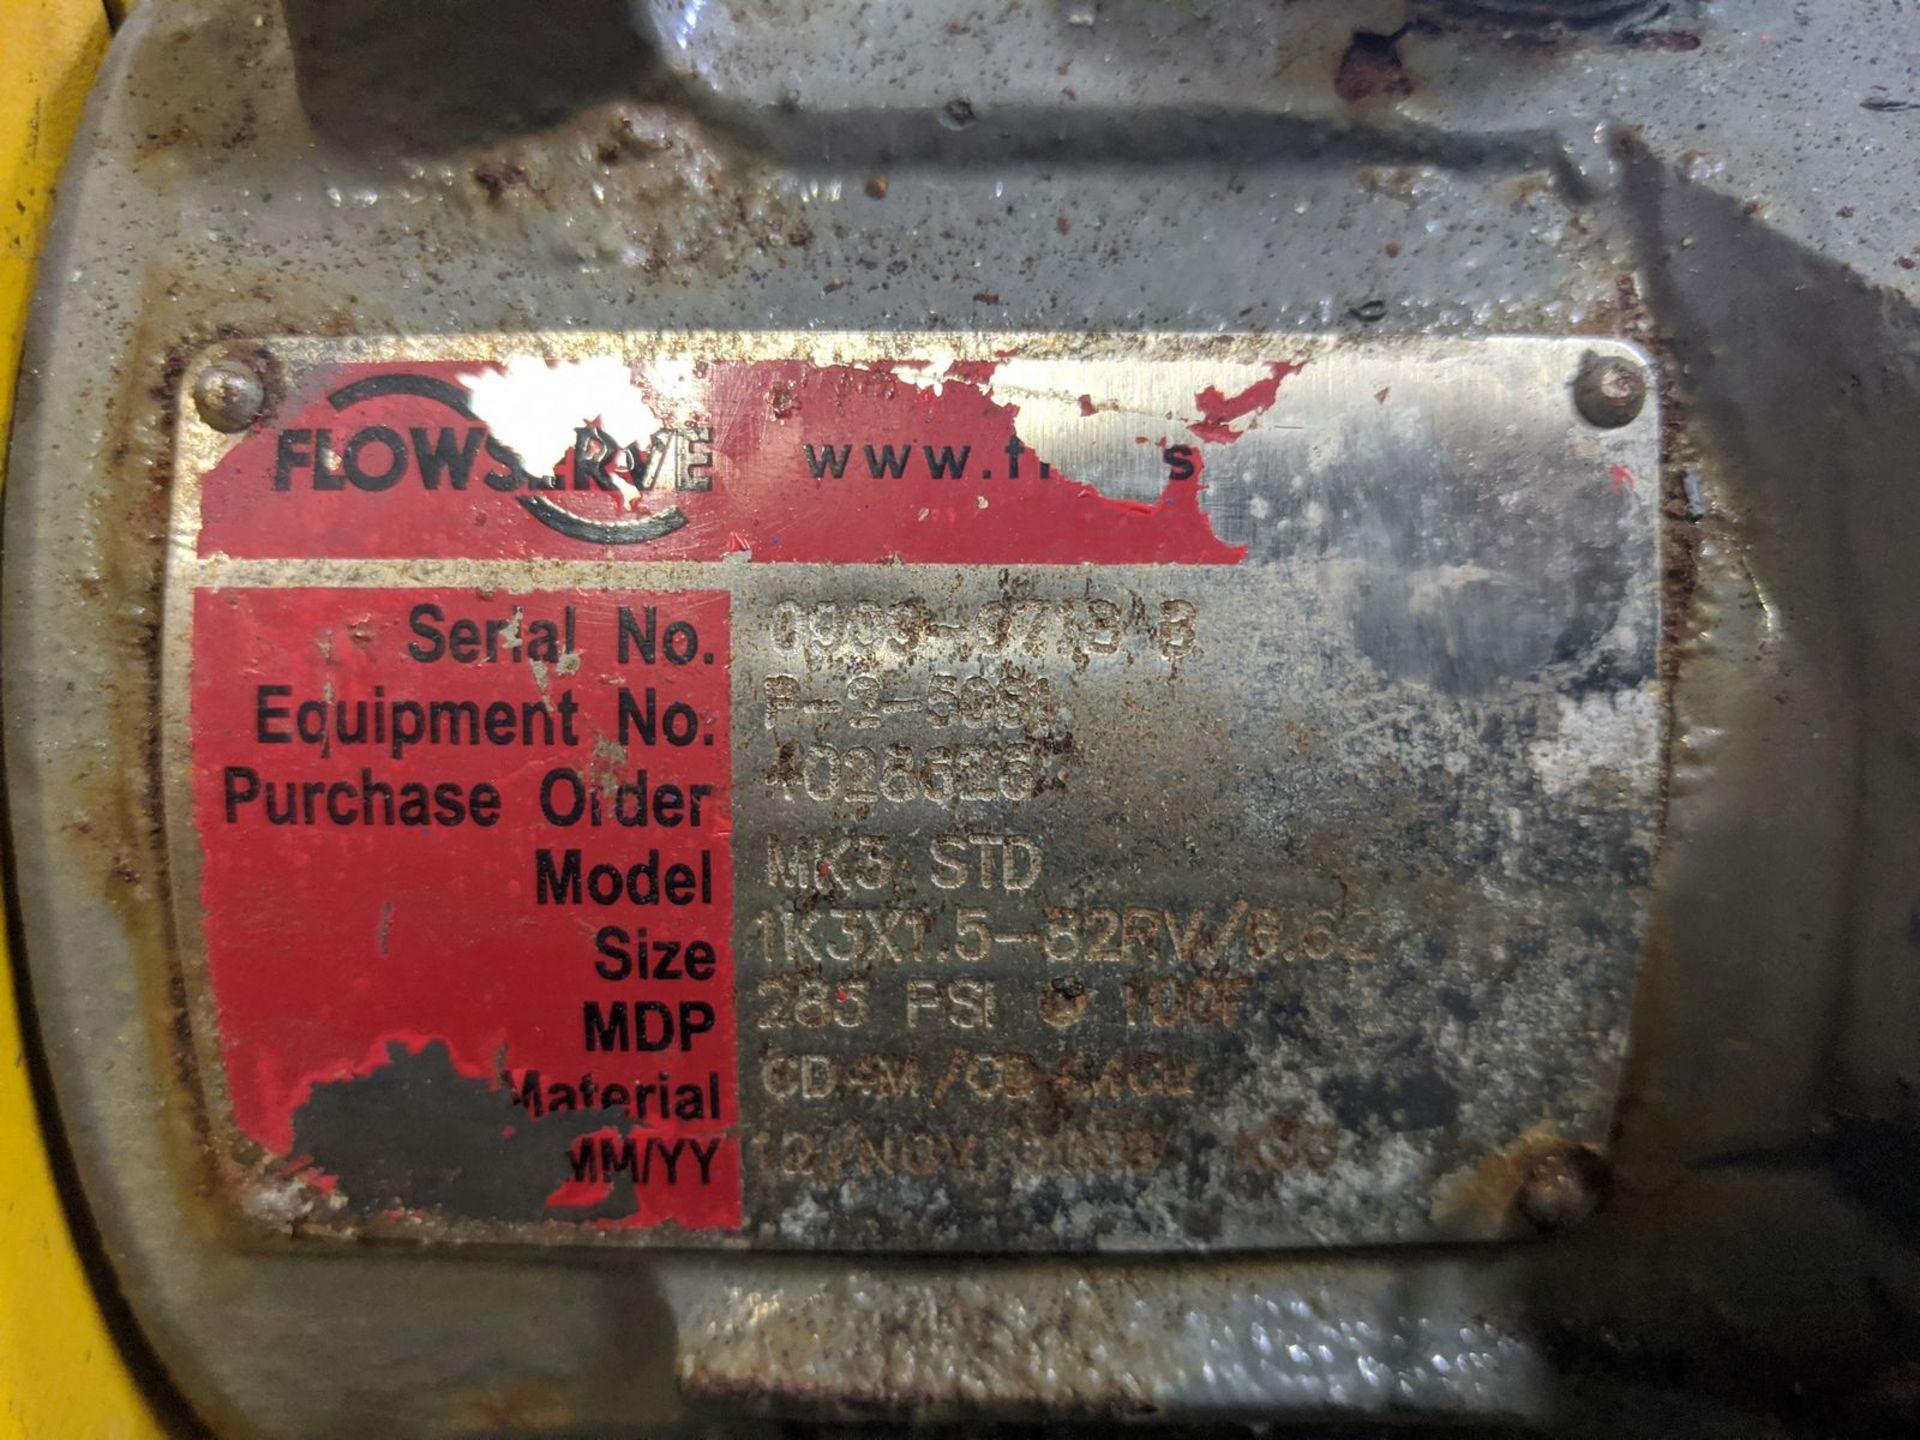 Flowserve Model MK3STD 15 HP Centrifugal Pump - Image 2 of 3